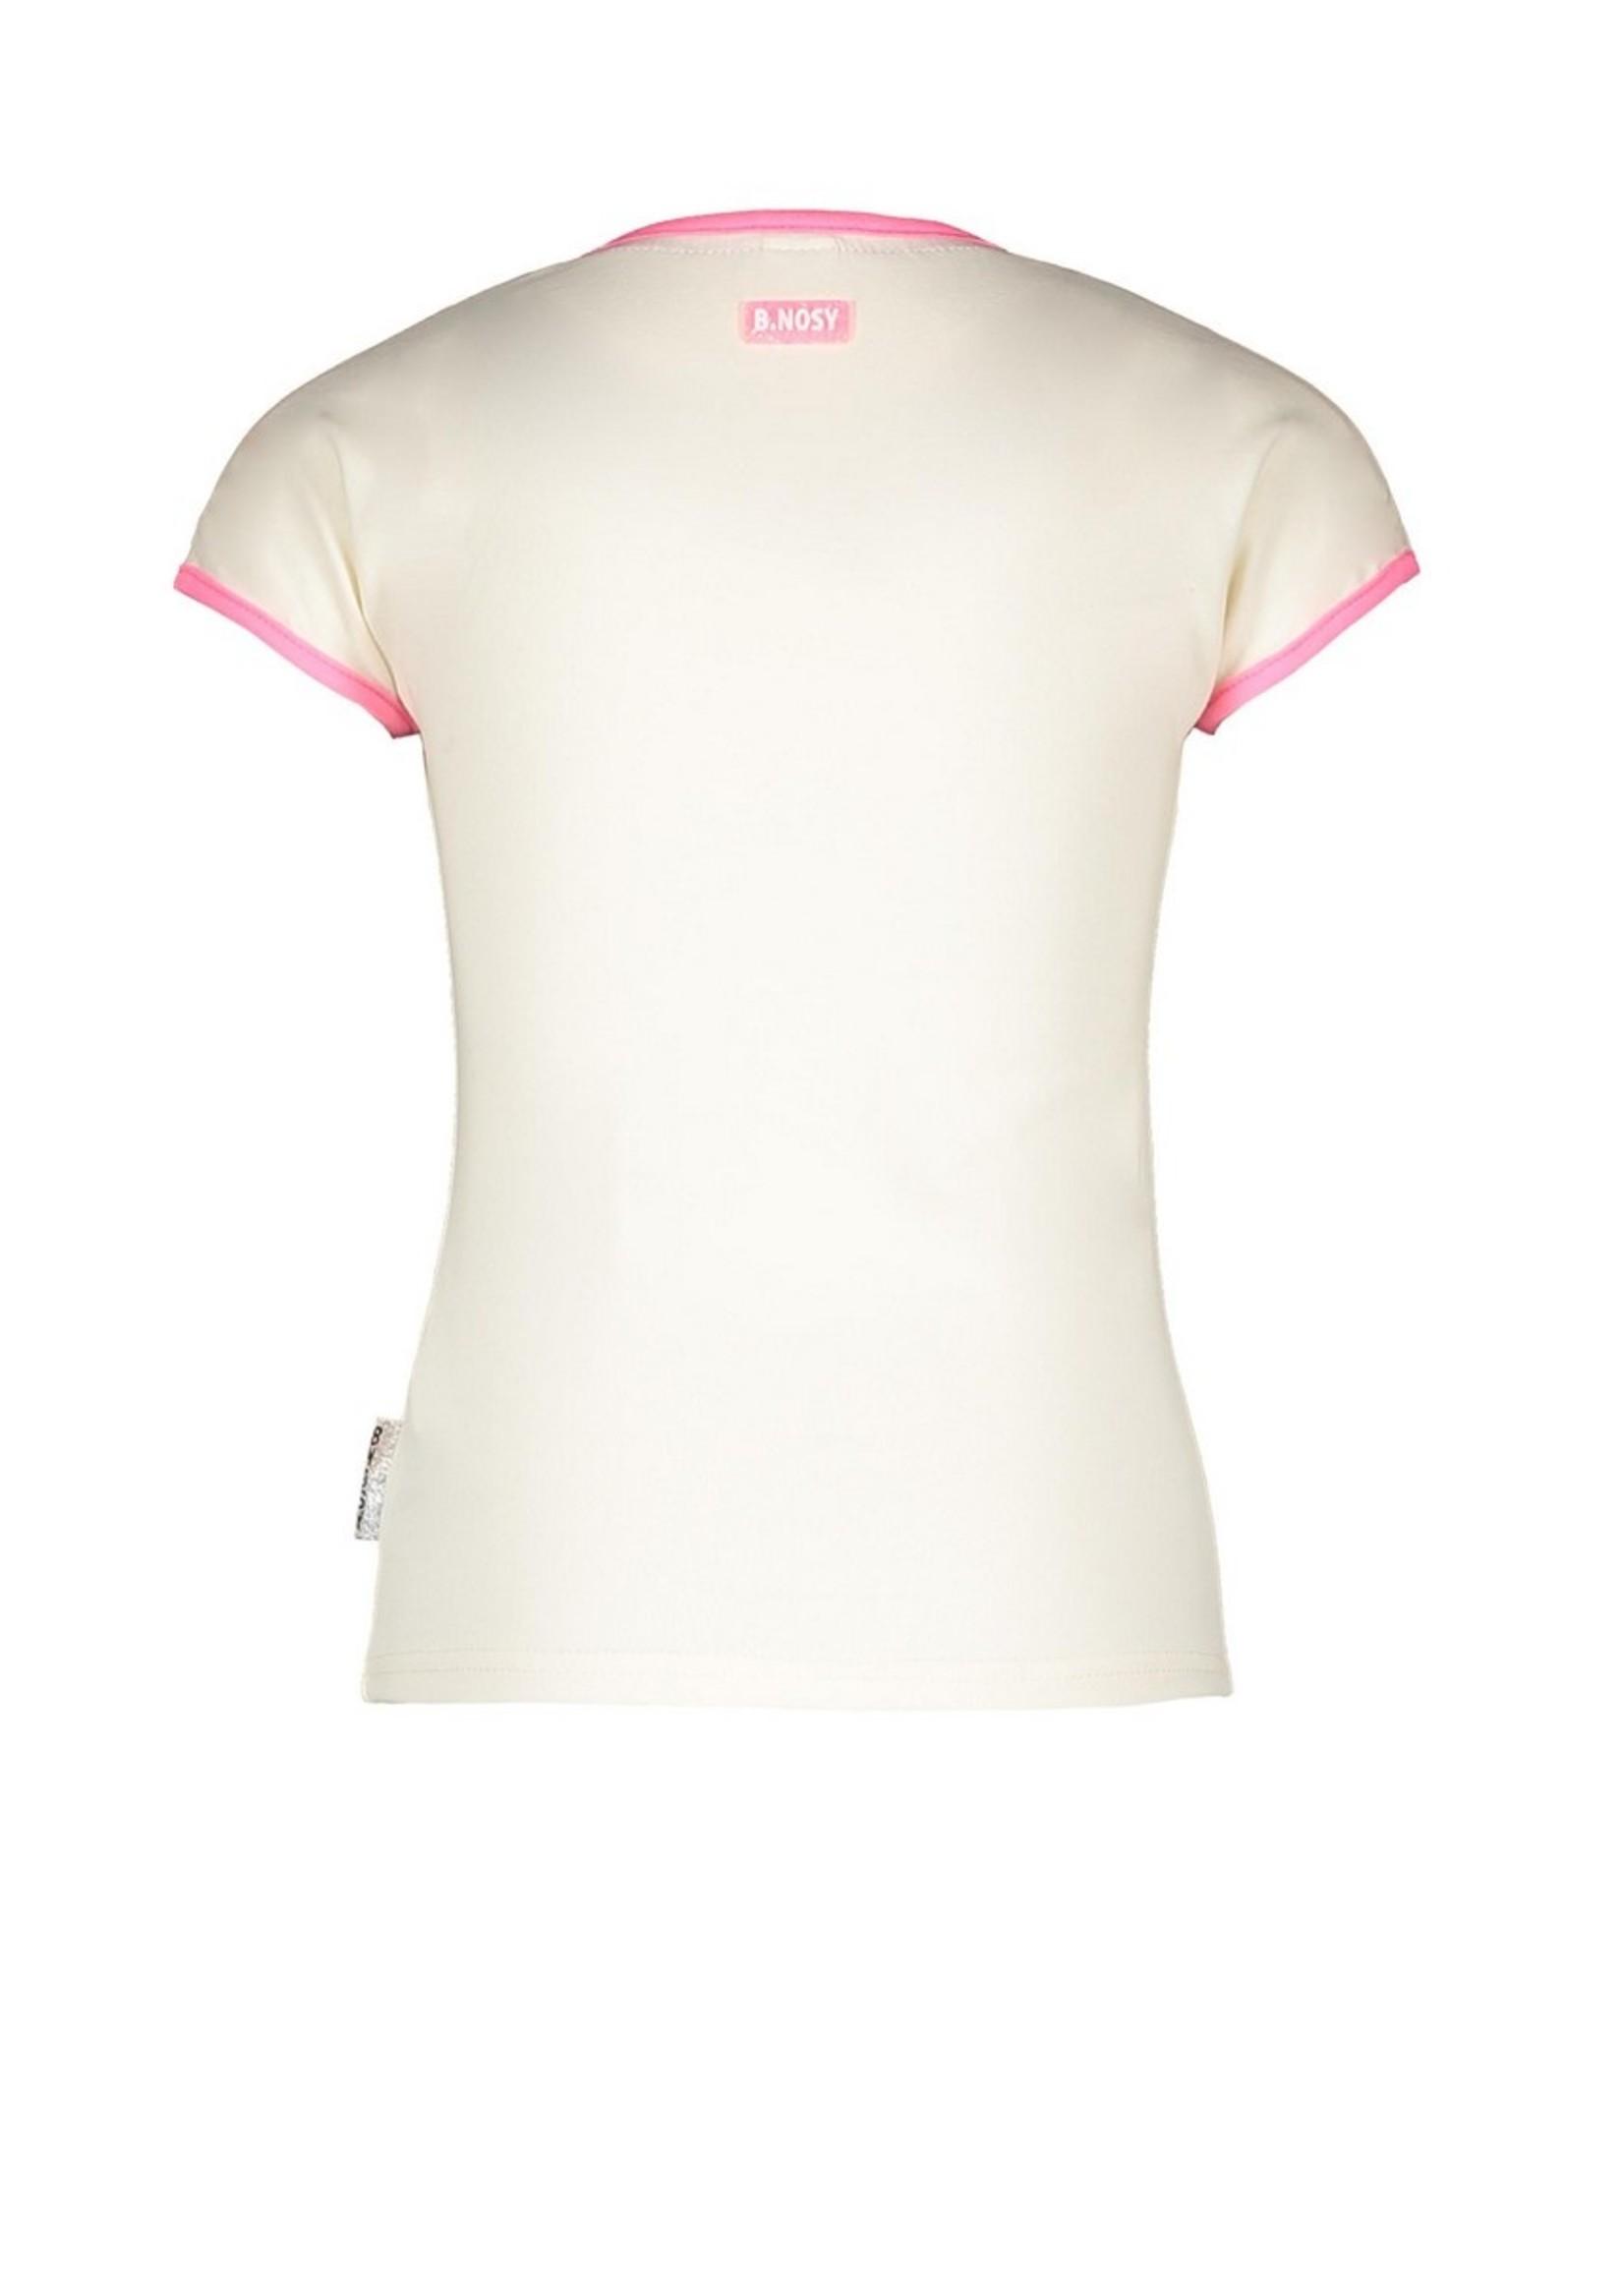 B.nosy Shirt Cotton